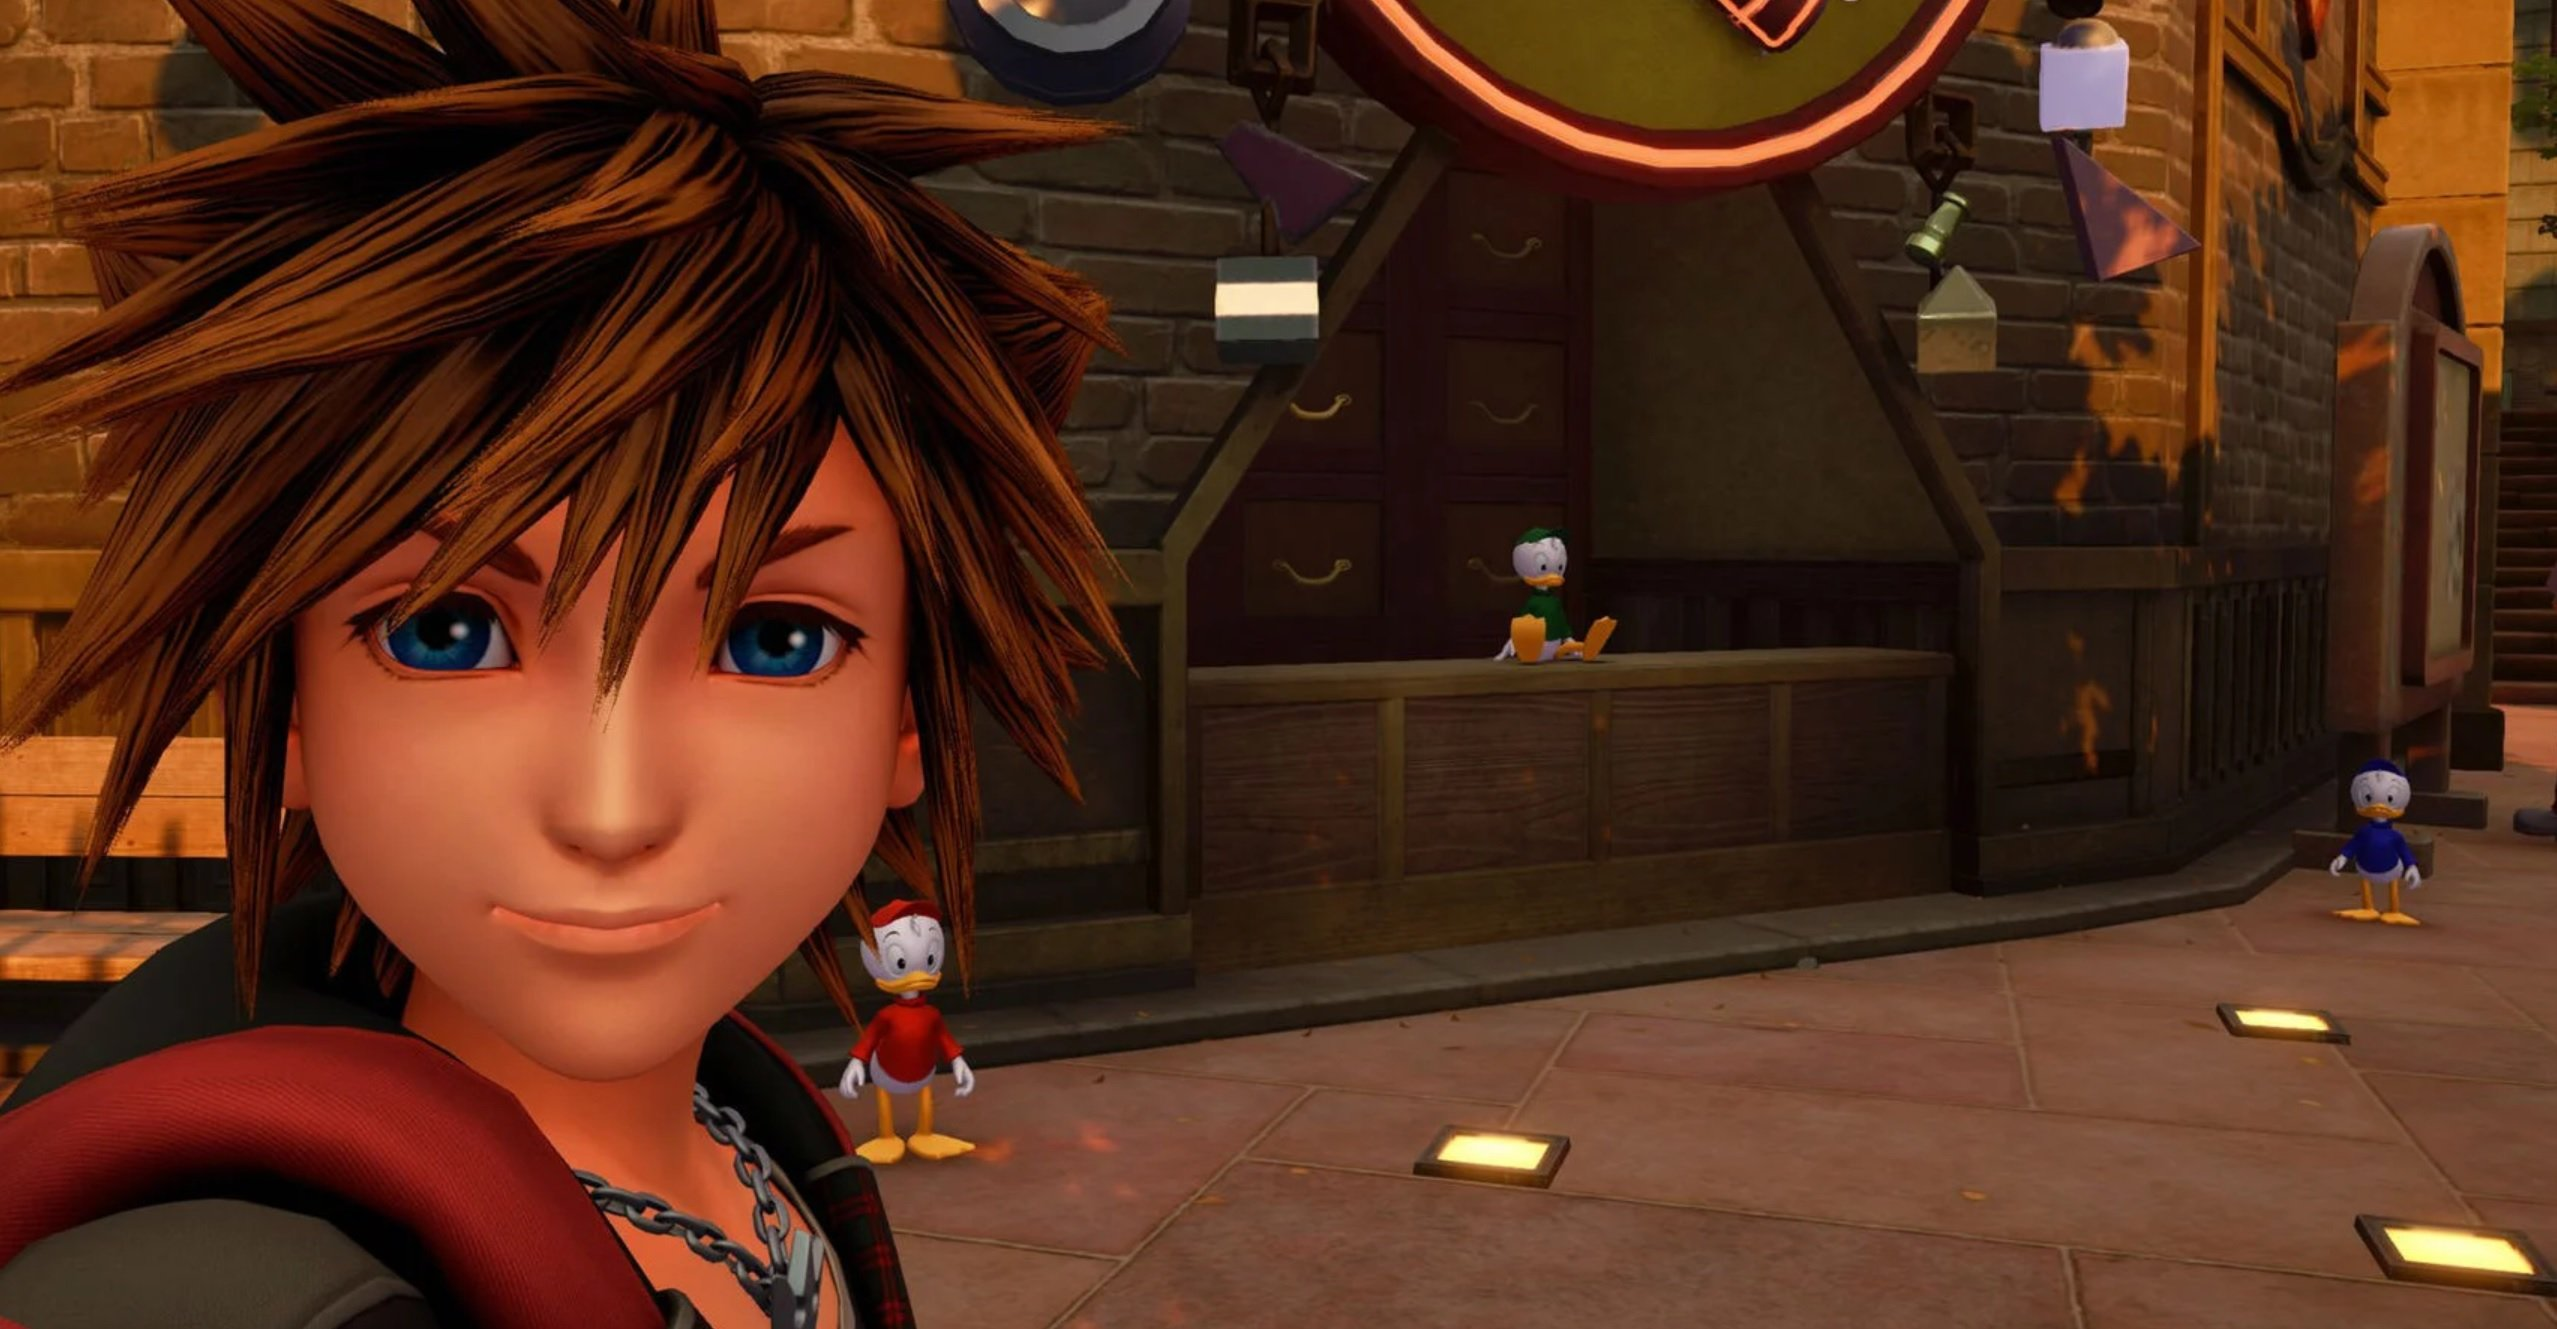 Kingdom Hearts III is getting a greatly expanded photo mode, including a slideshow option screenshot